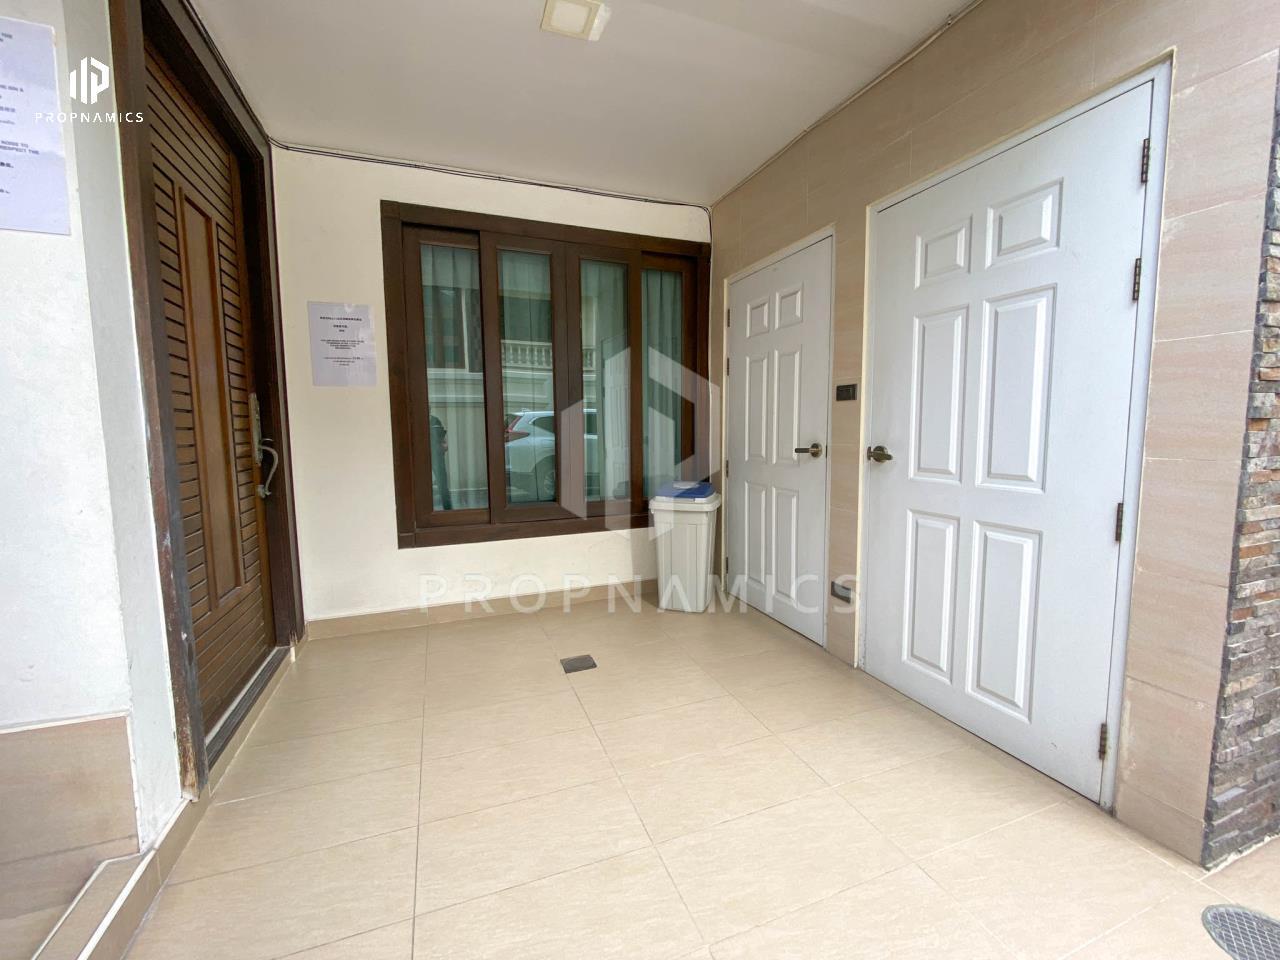 Propnamics Co., Ltd Agency's FOR RENT: SINGLE HOUSE IN SUKHUMVIT 26 1